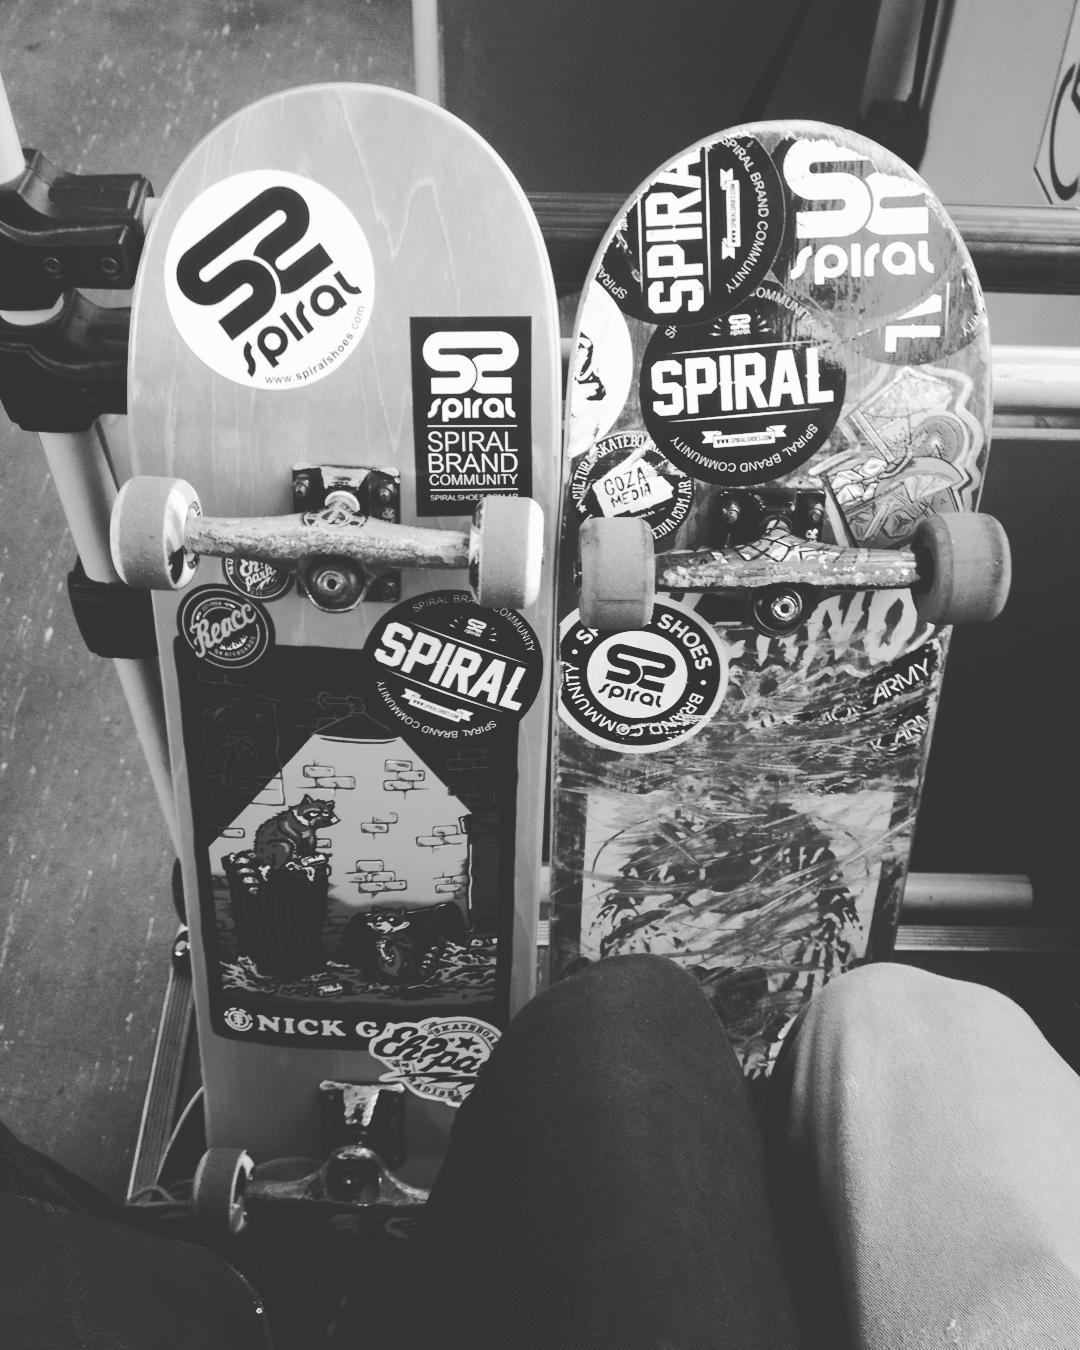 @axlmat @nashprosty Skate Sesion #SpiralSkateboarding #GoSkate #QualityShoes